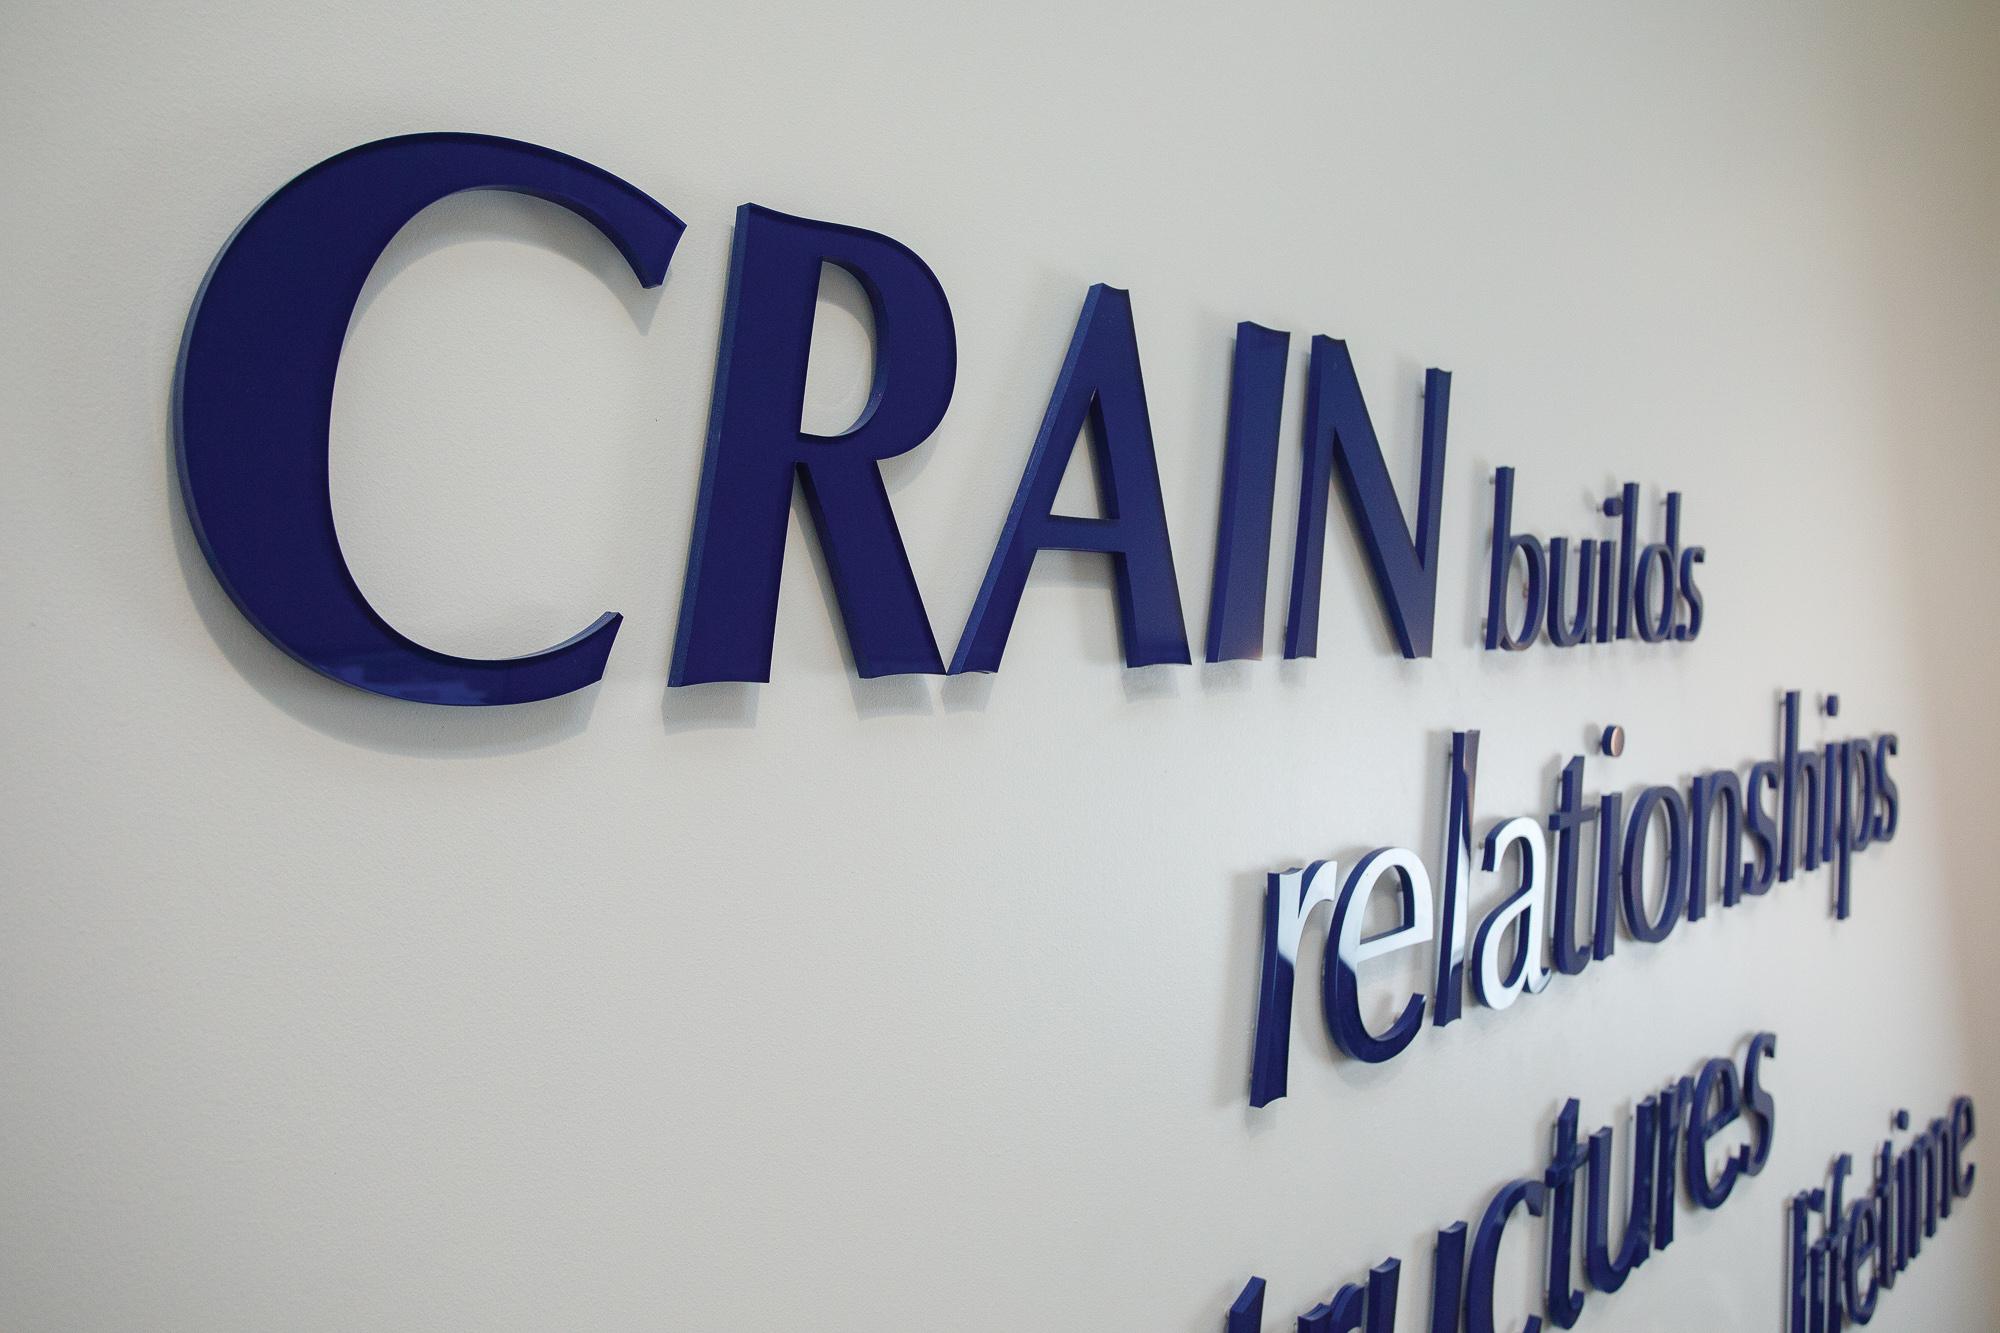 Crain Construction_Brand Identity Signage_Lobby Wall_Acrylic letters_MG_8003_small 2000 px.jpg